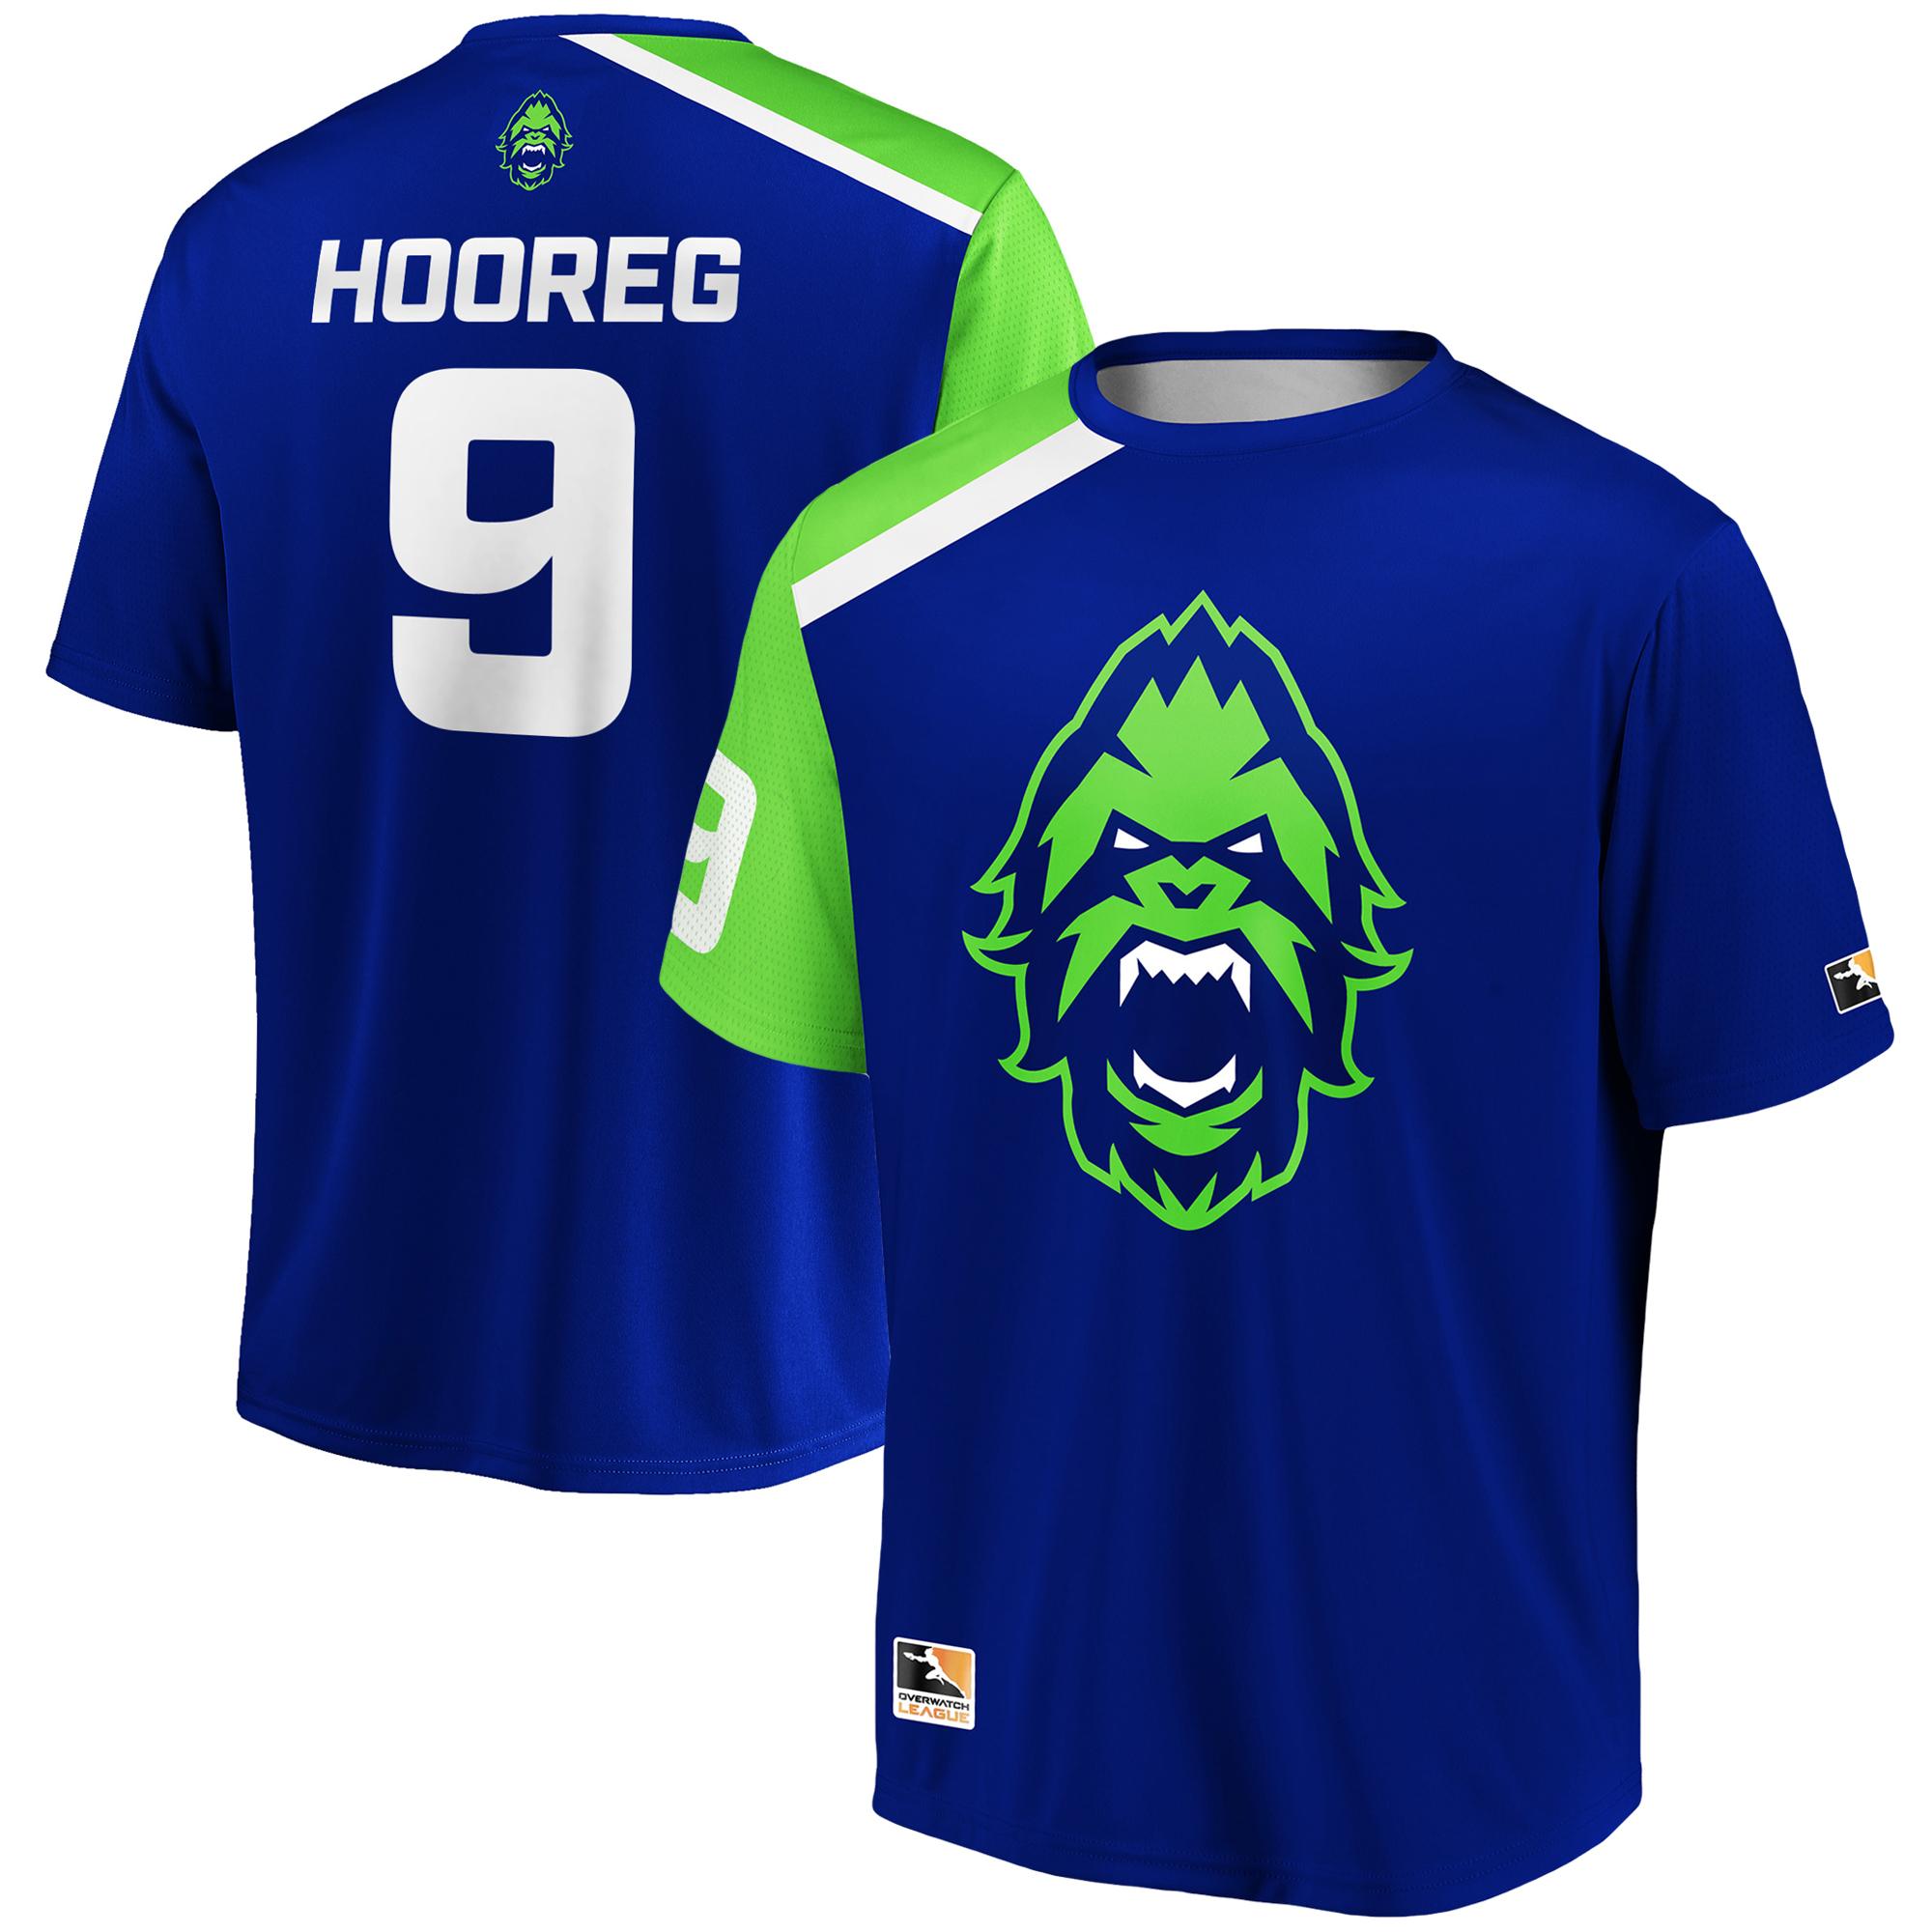 Hooreg Vancouver Titans Overwatch League Replica Home Jersey - Blue